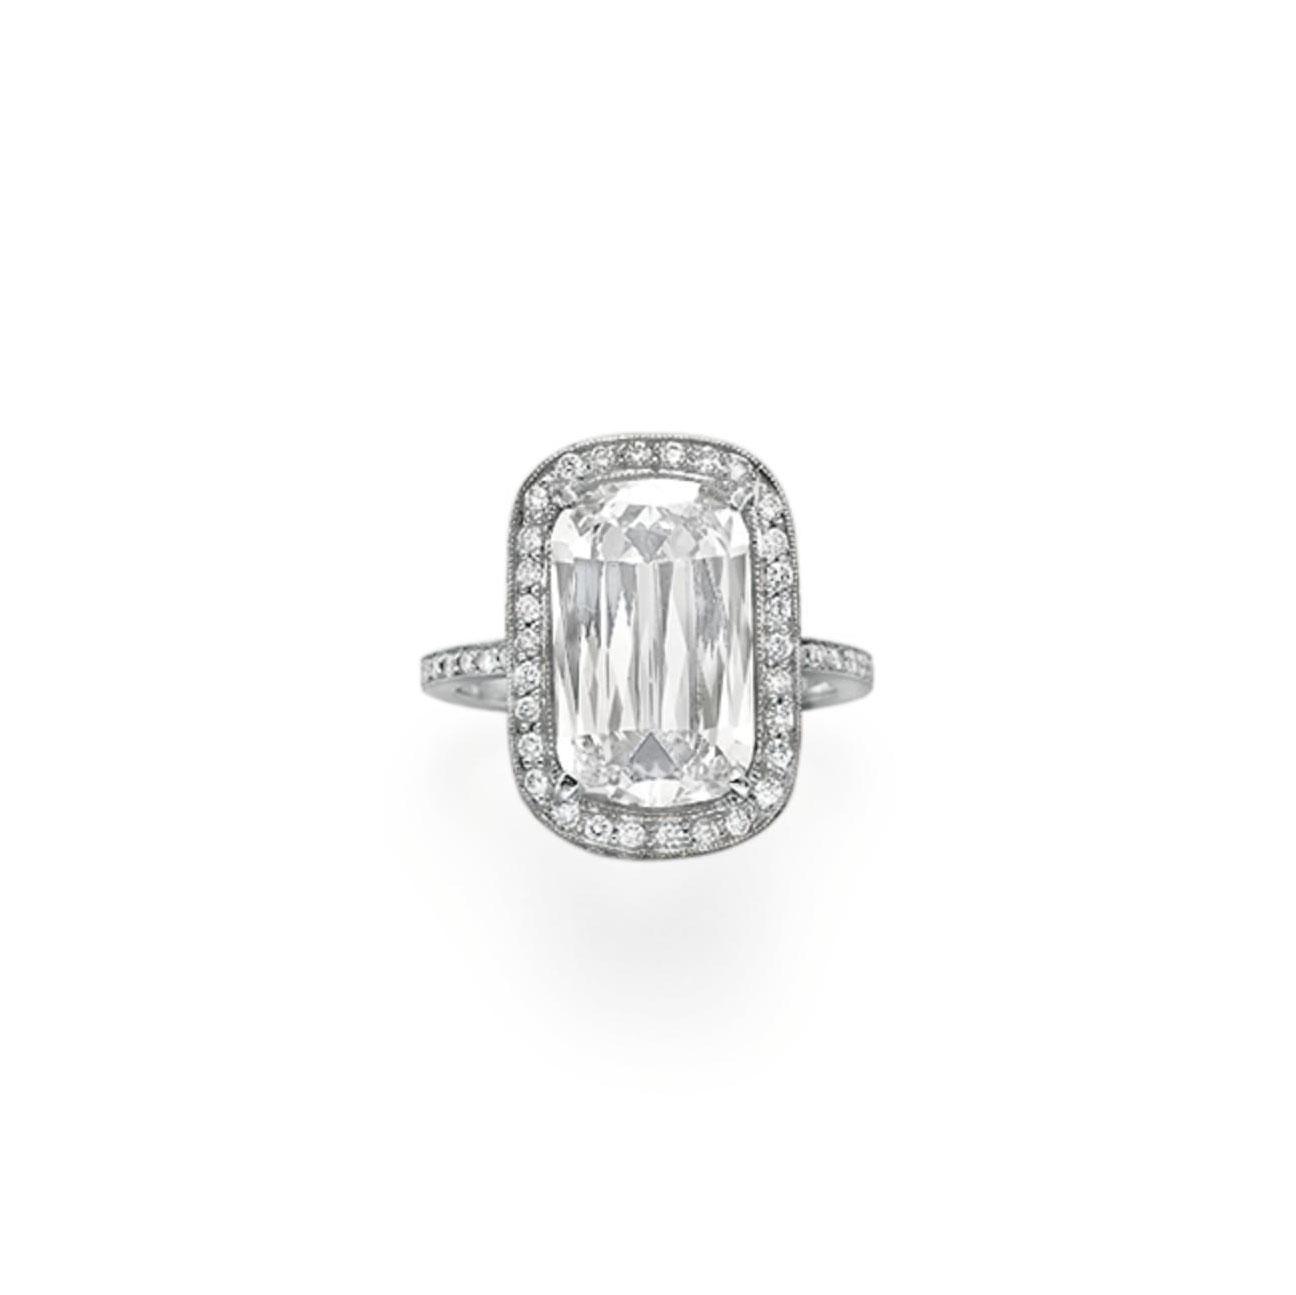 A DIAMOND RING, BY WILLIAM GOLDBERG